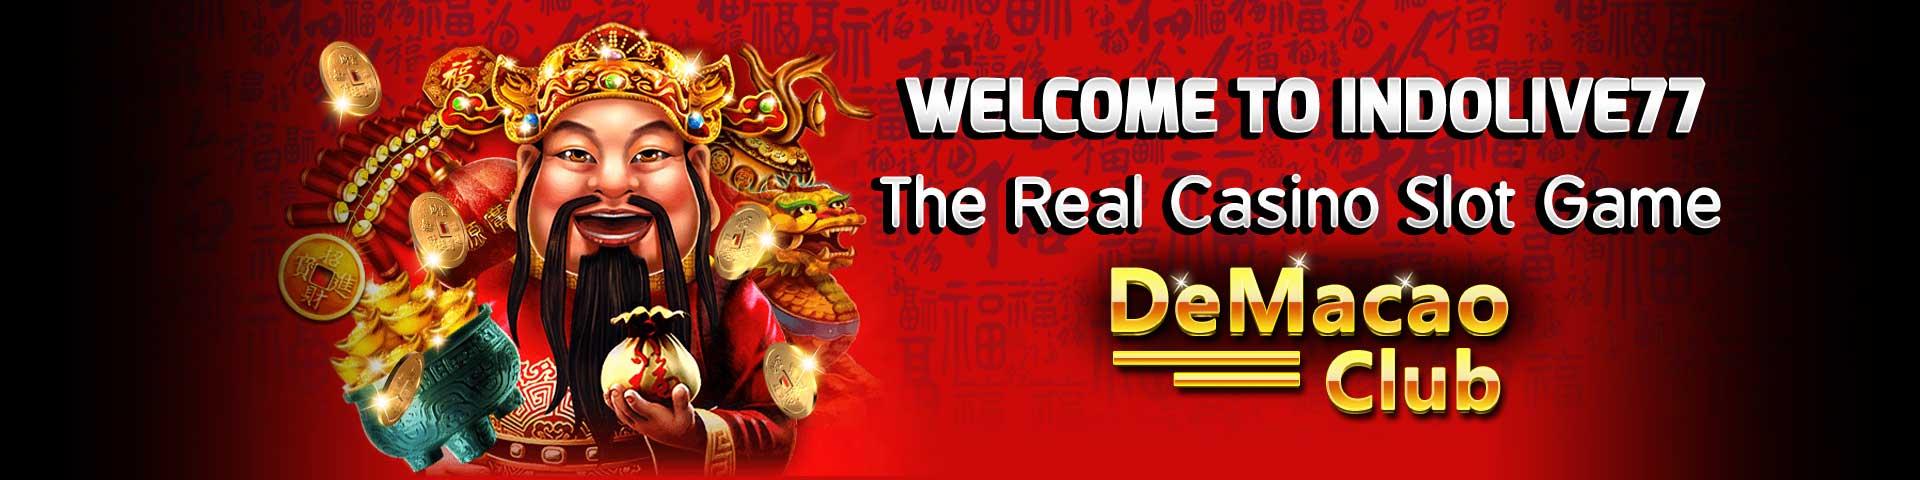 Demacao Club Situs Game Mesin Slot Online Uang Asli Indonesia